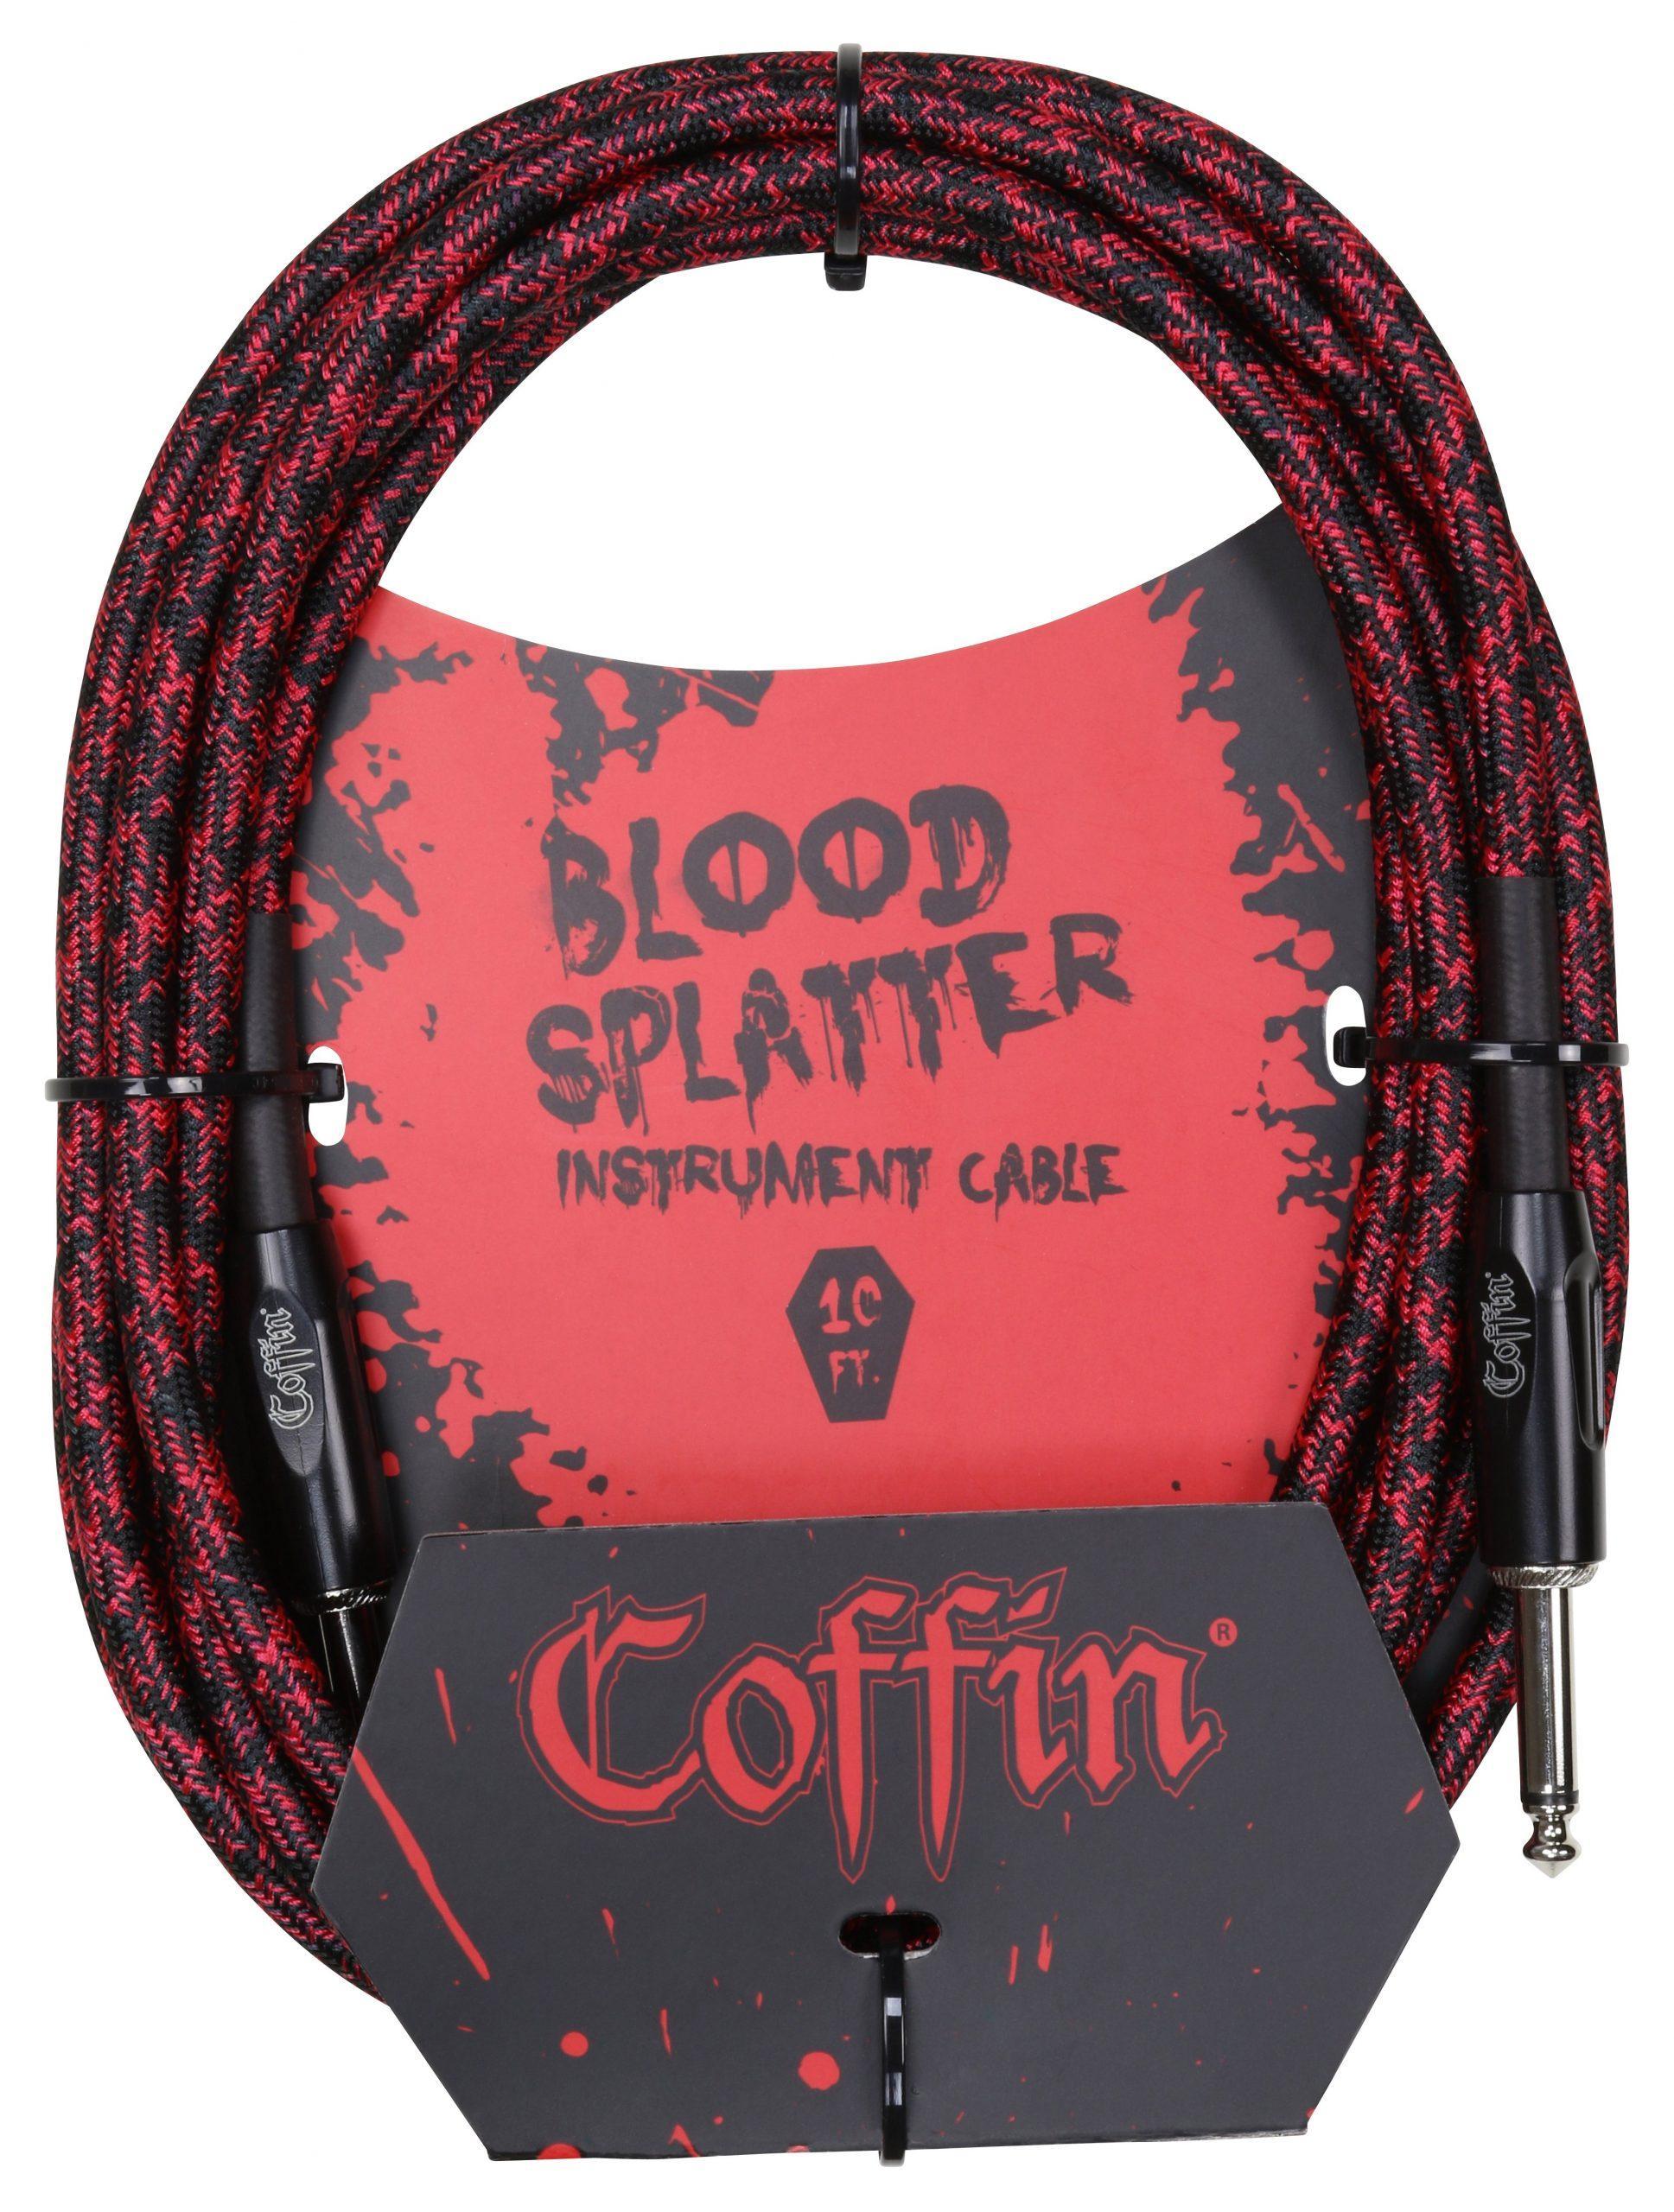 Bloodsplatter Instrument Cable 10ft. Straight